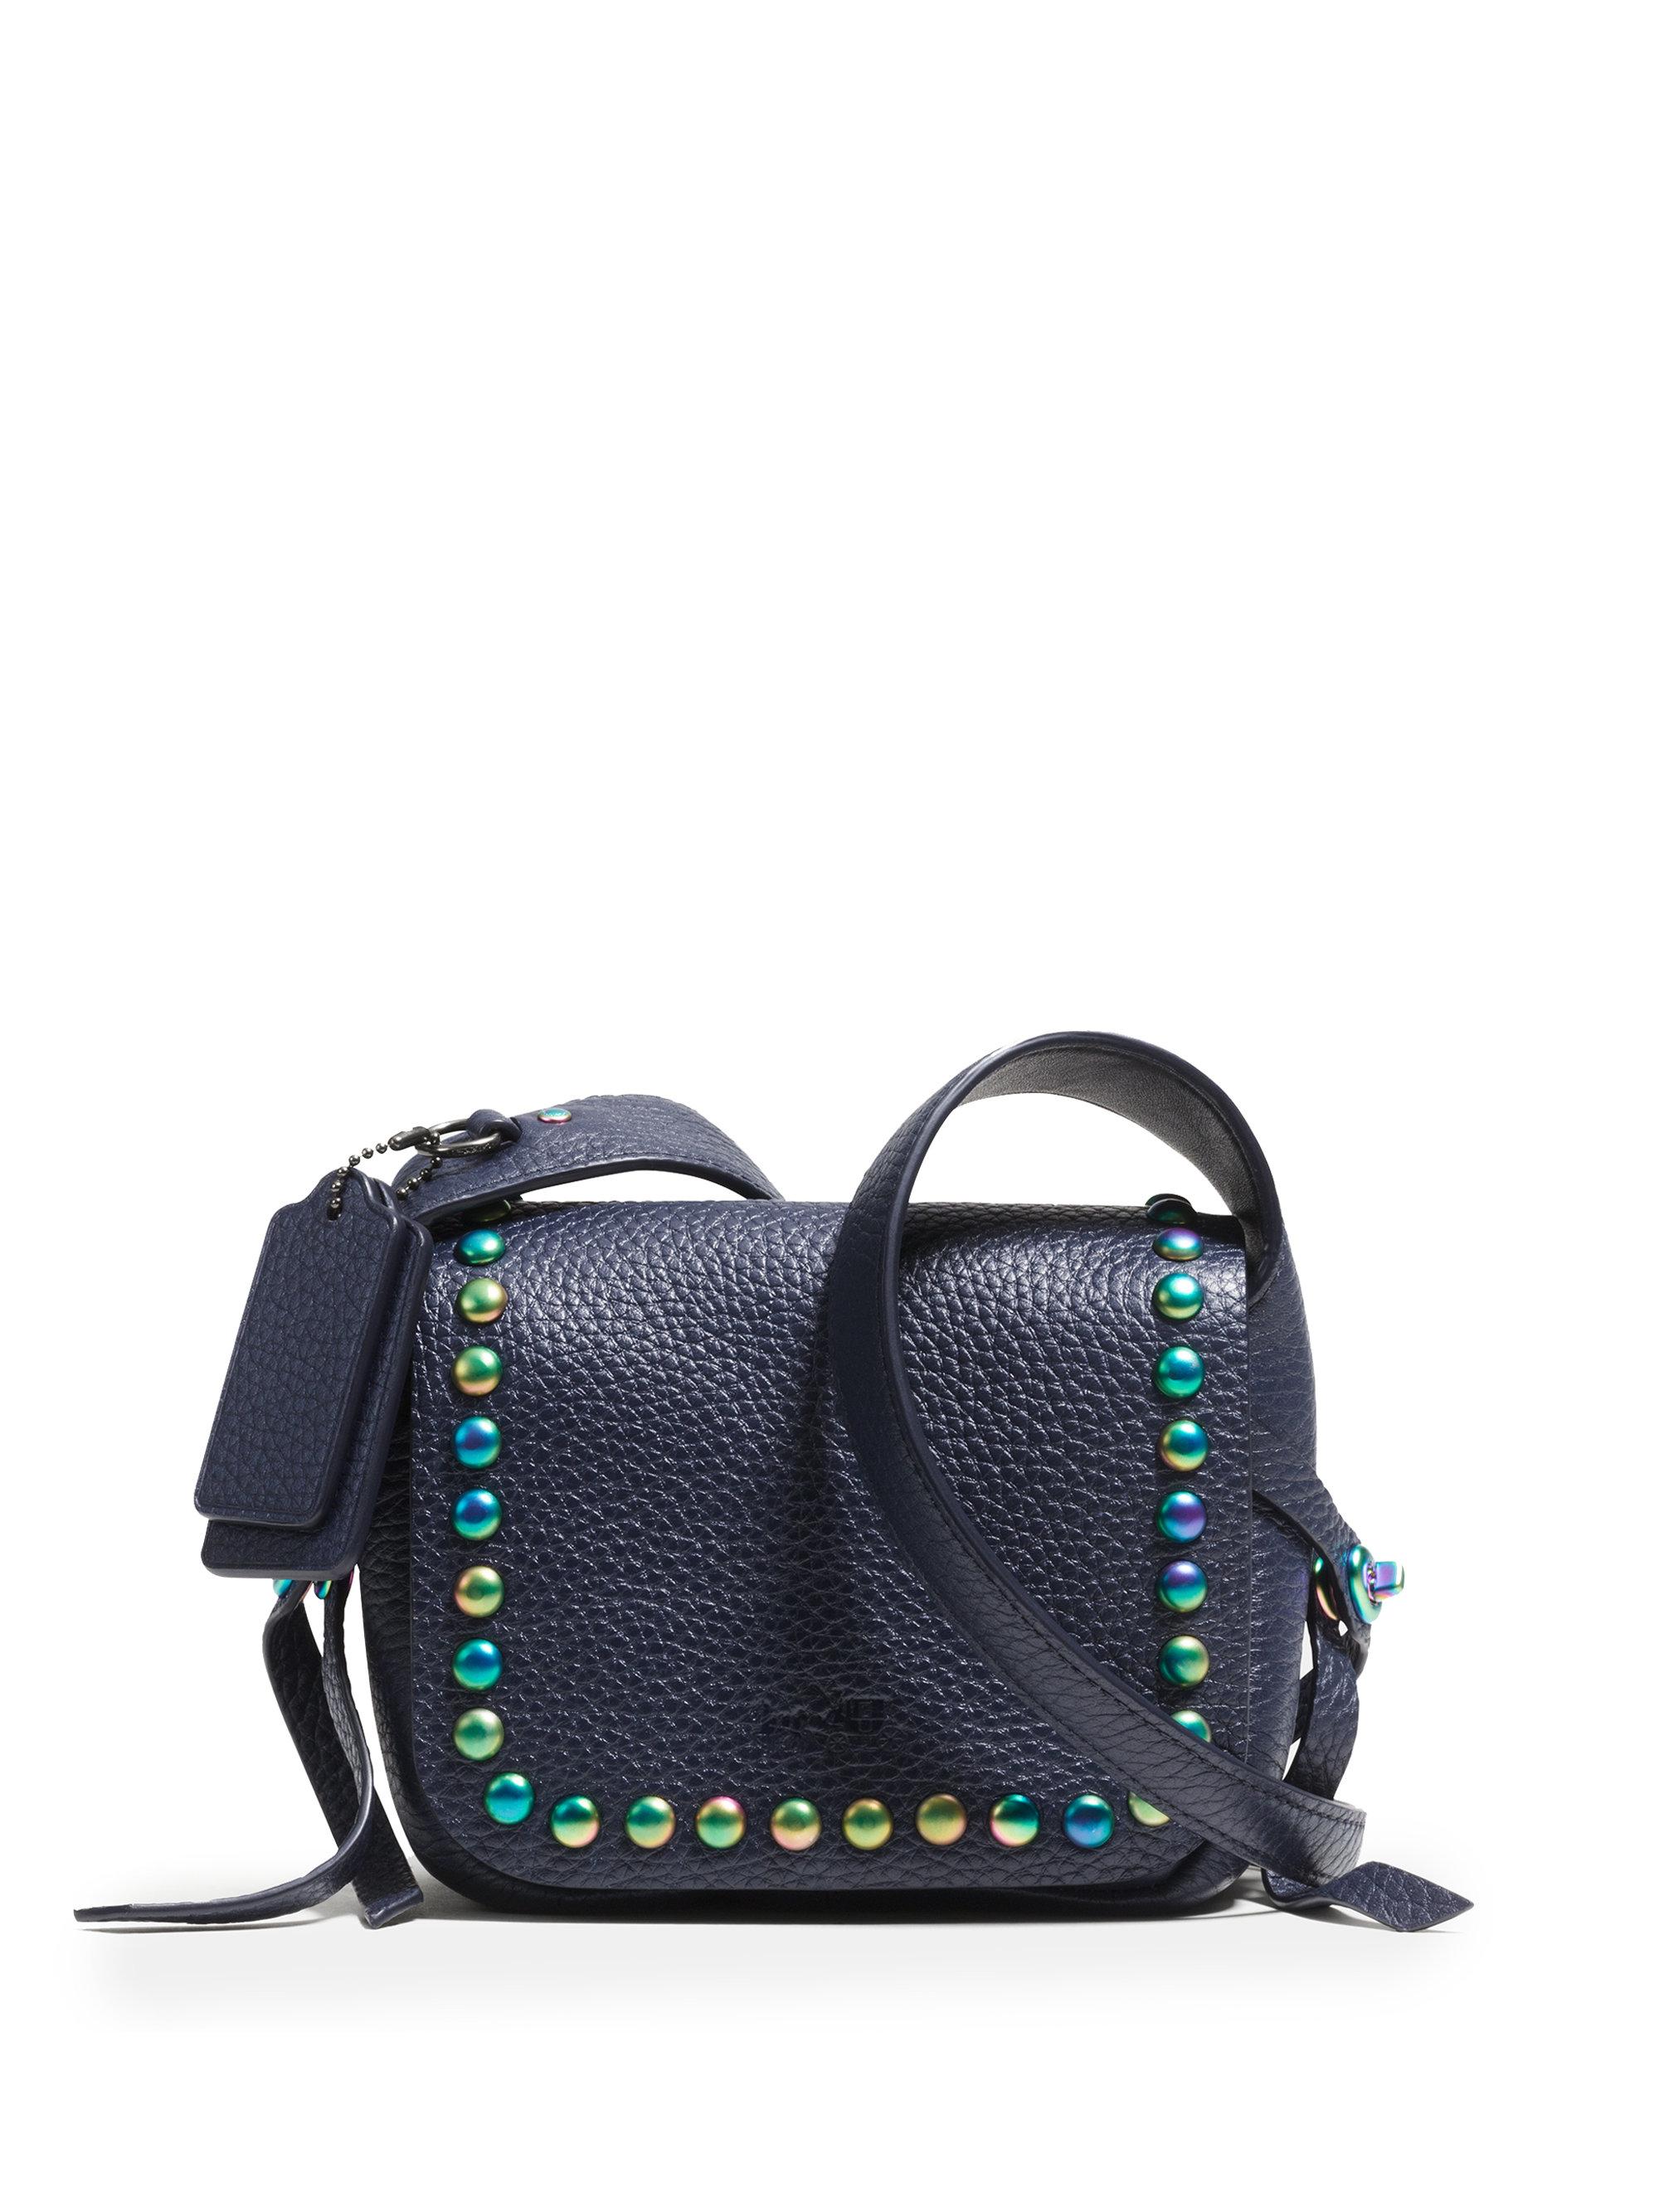 e0ba1ad9cd ... sale lyst coach dakotah 14 studded leather crossbody bag in blue 394a2  fa9bc